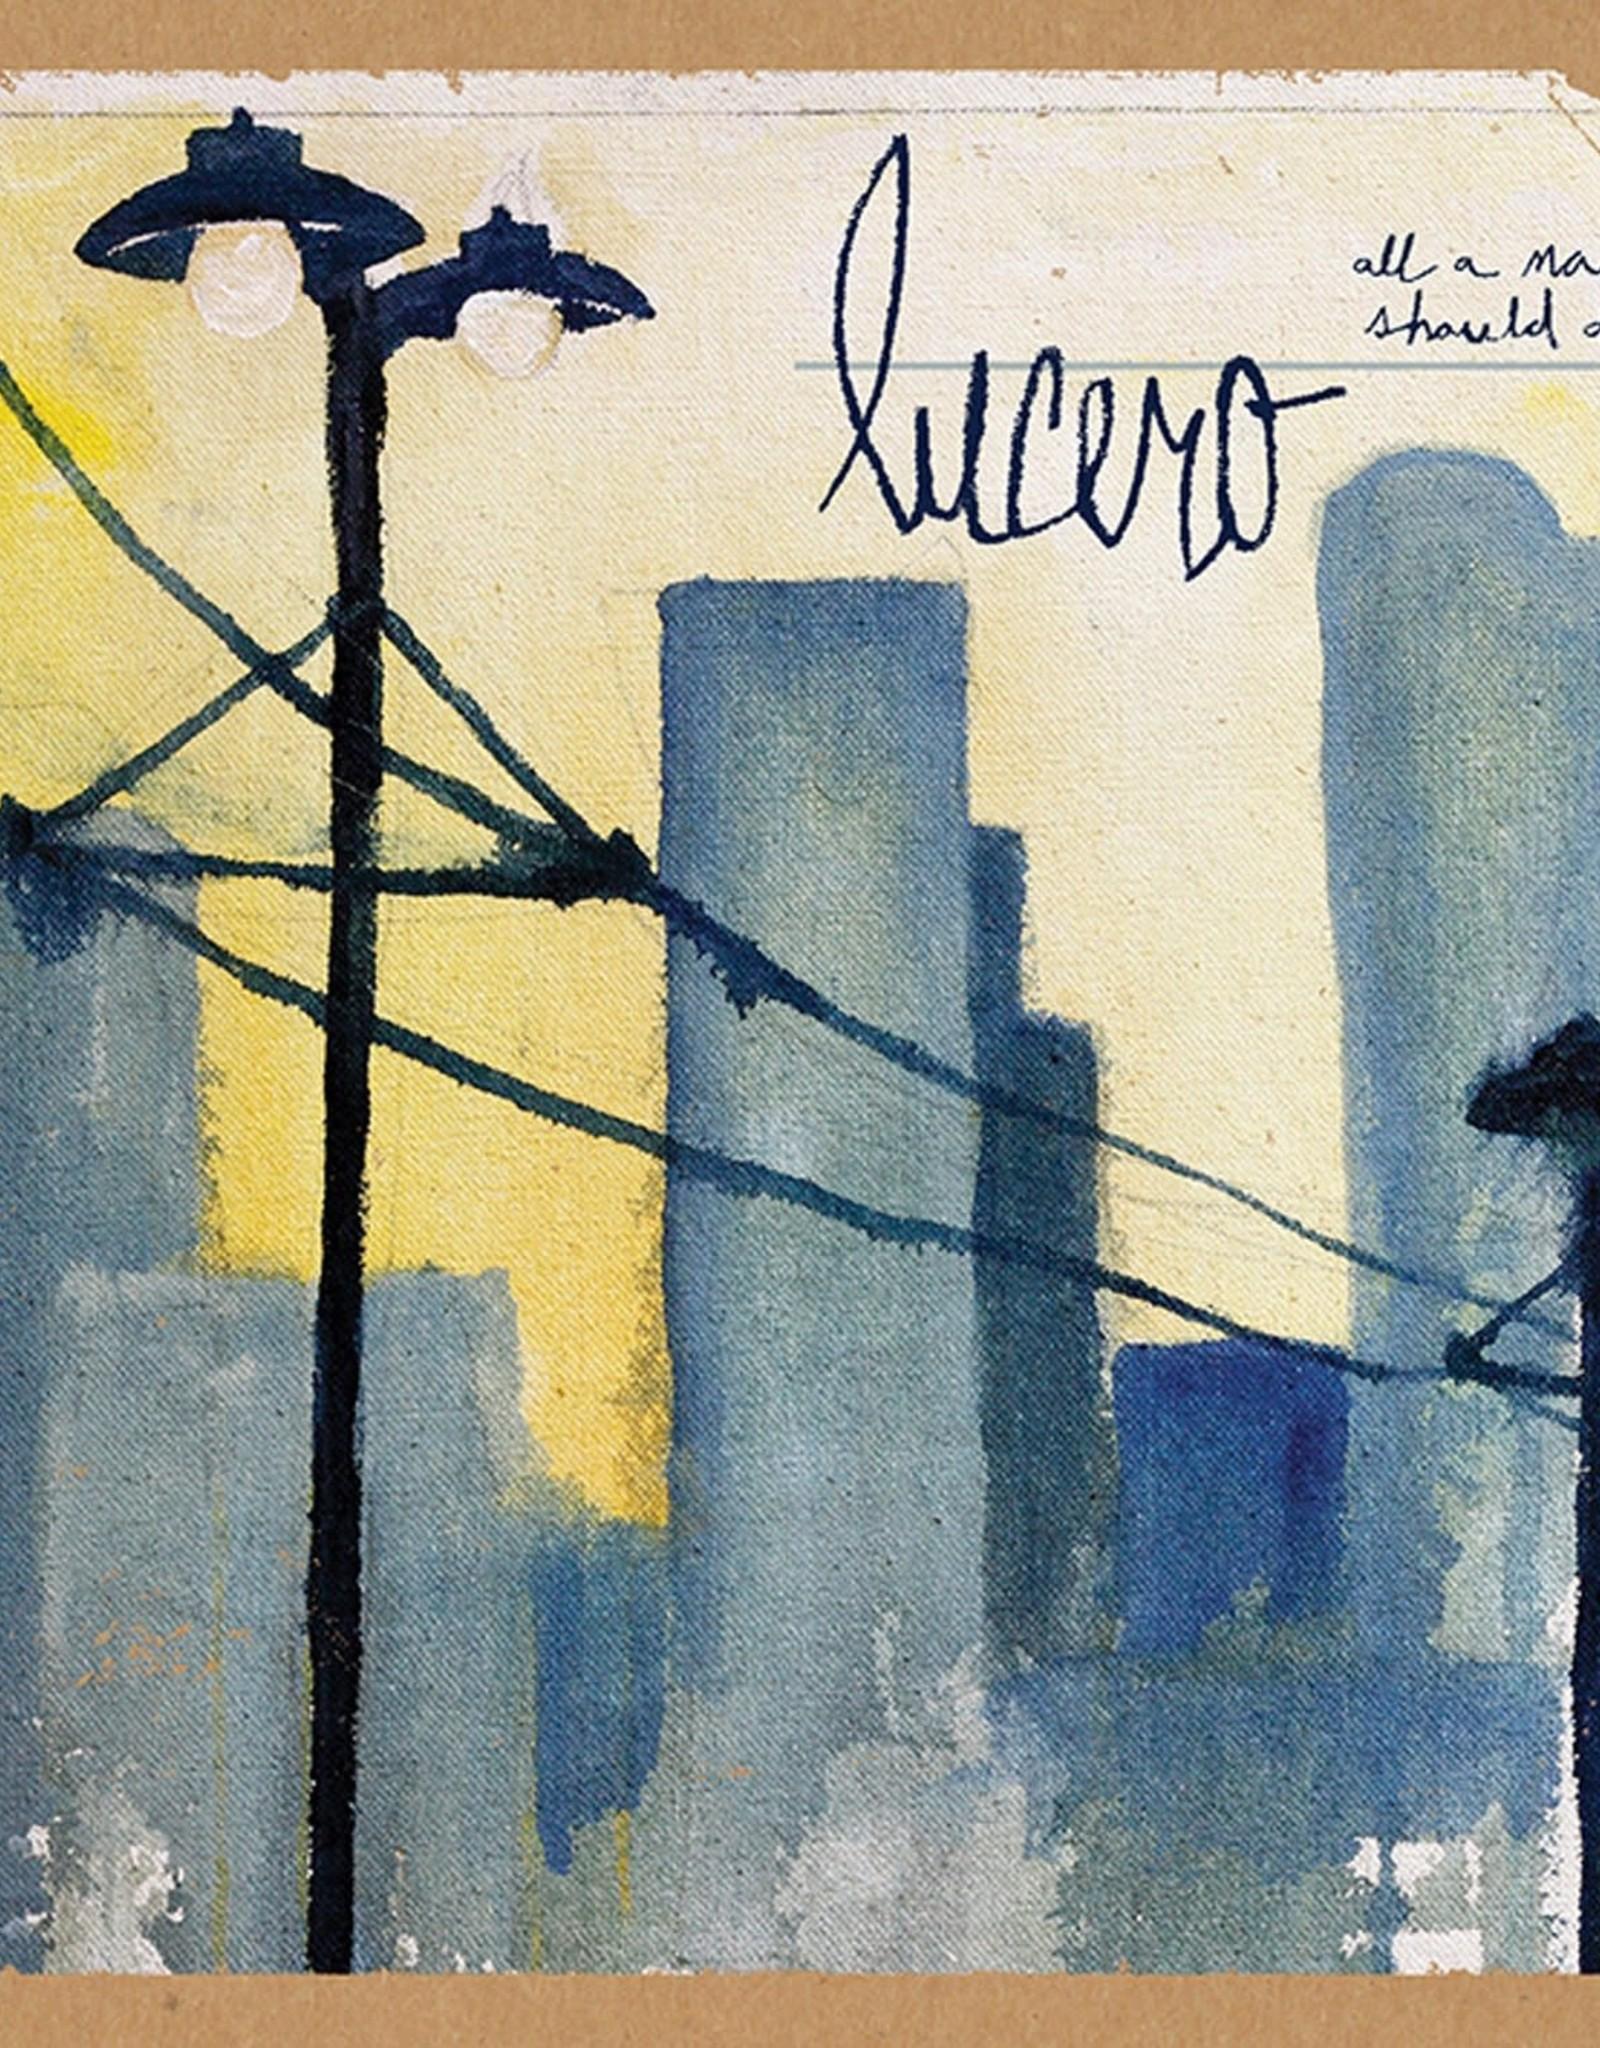 Lucero - All A Man Should Do - Lp